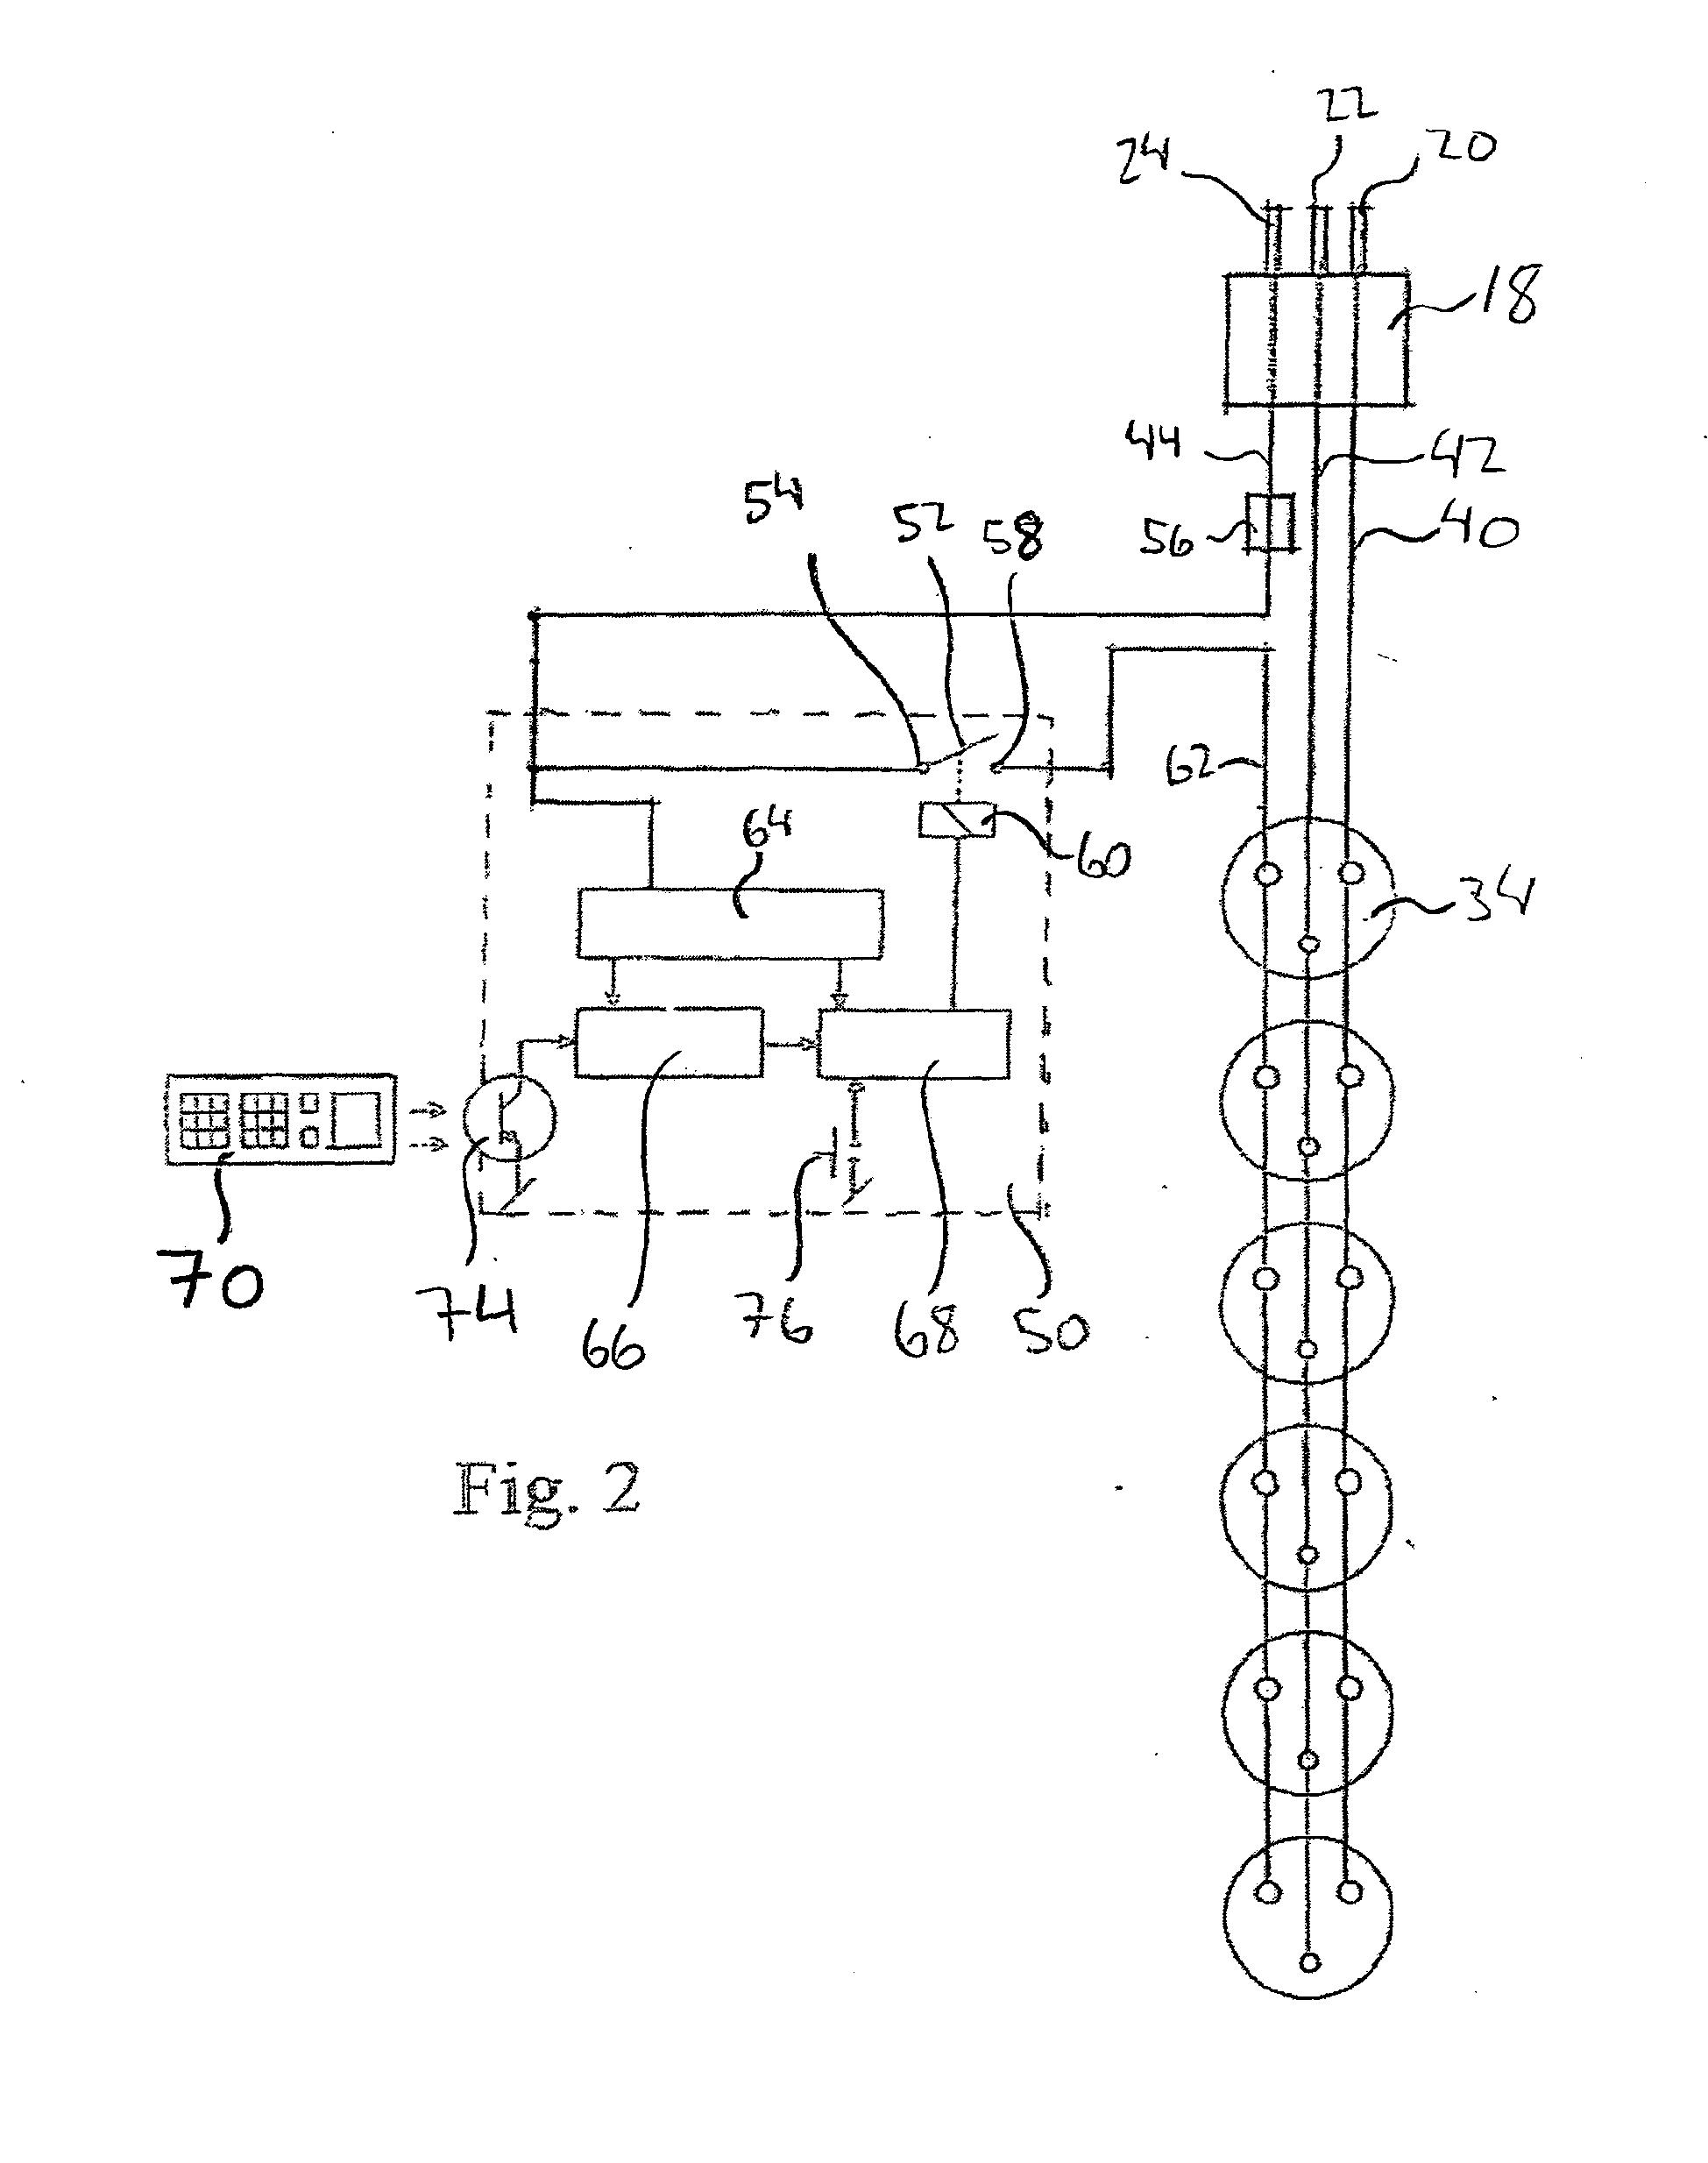 patent ep1653572a1 - a power strip device